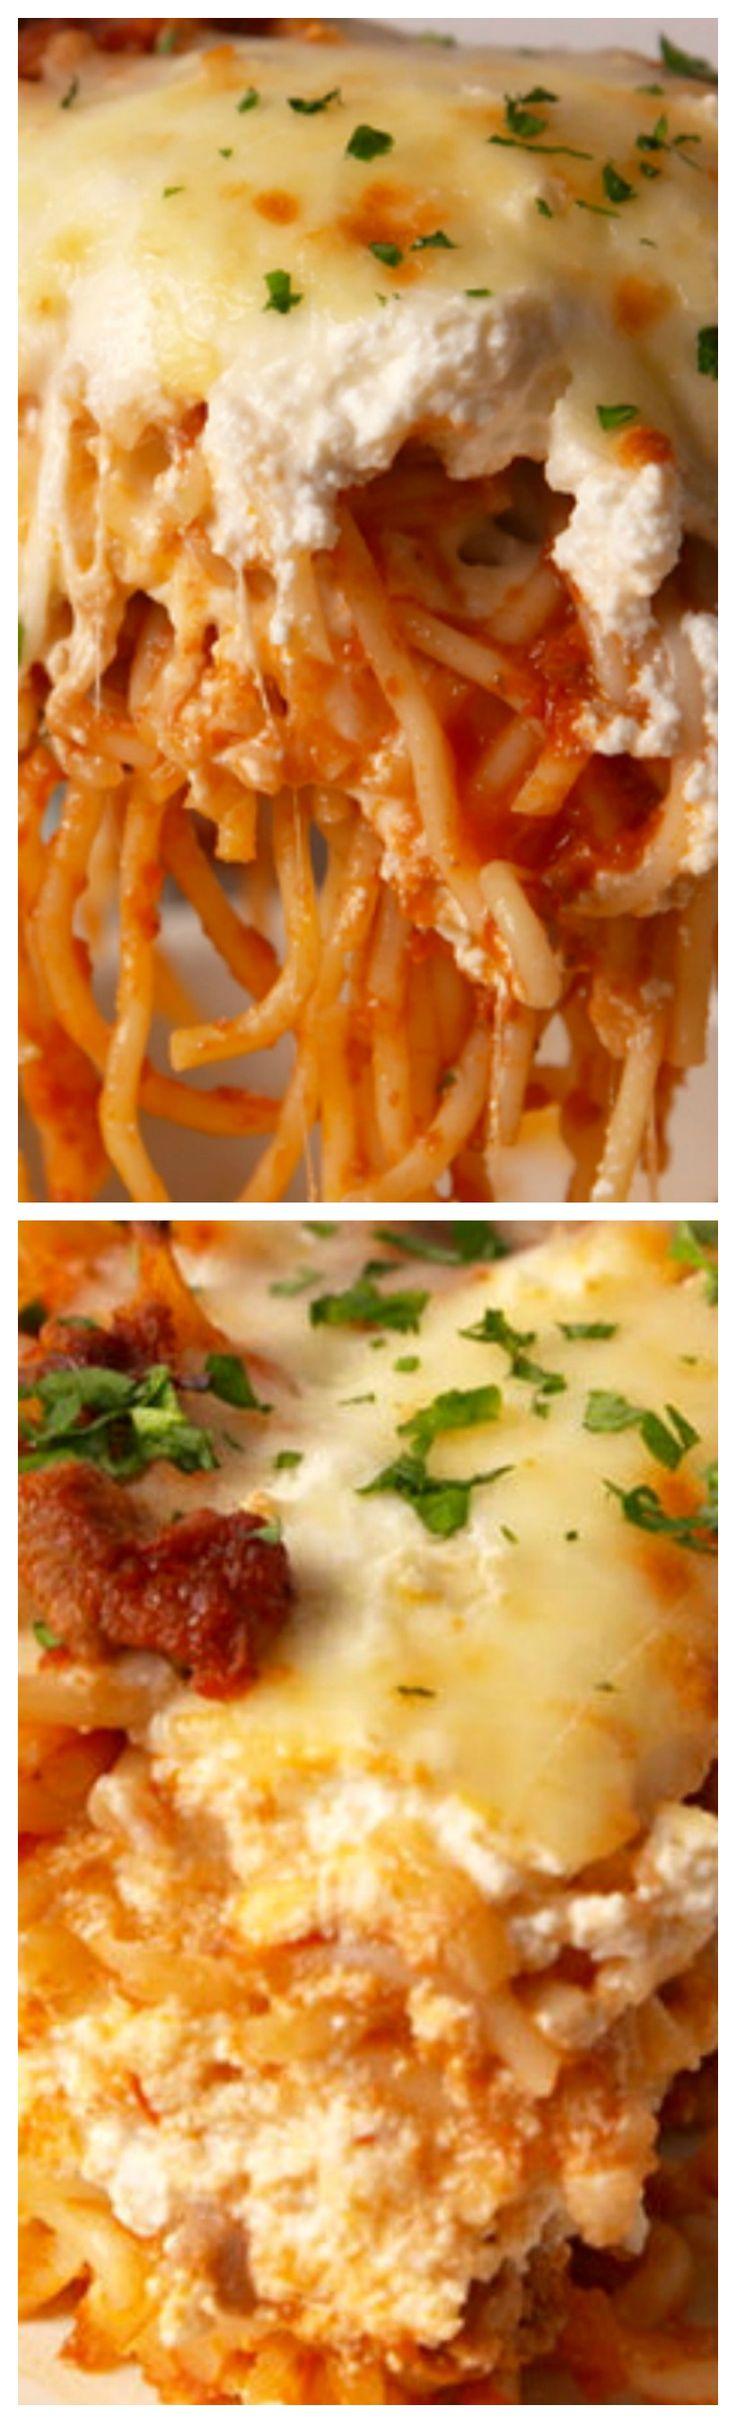 Spaghetti Lasagna ~ Delicious and so much easier to make than regular lasagna